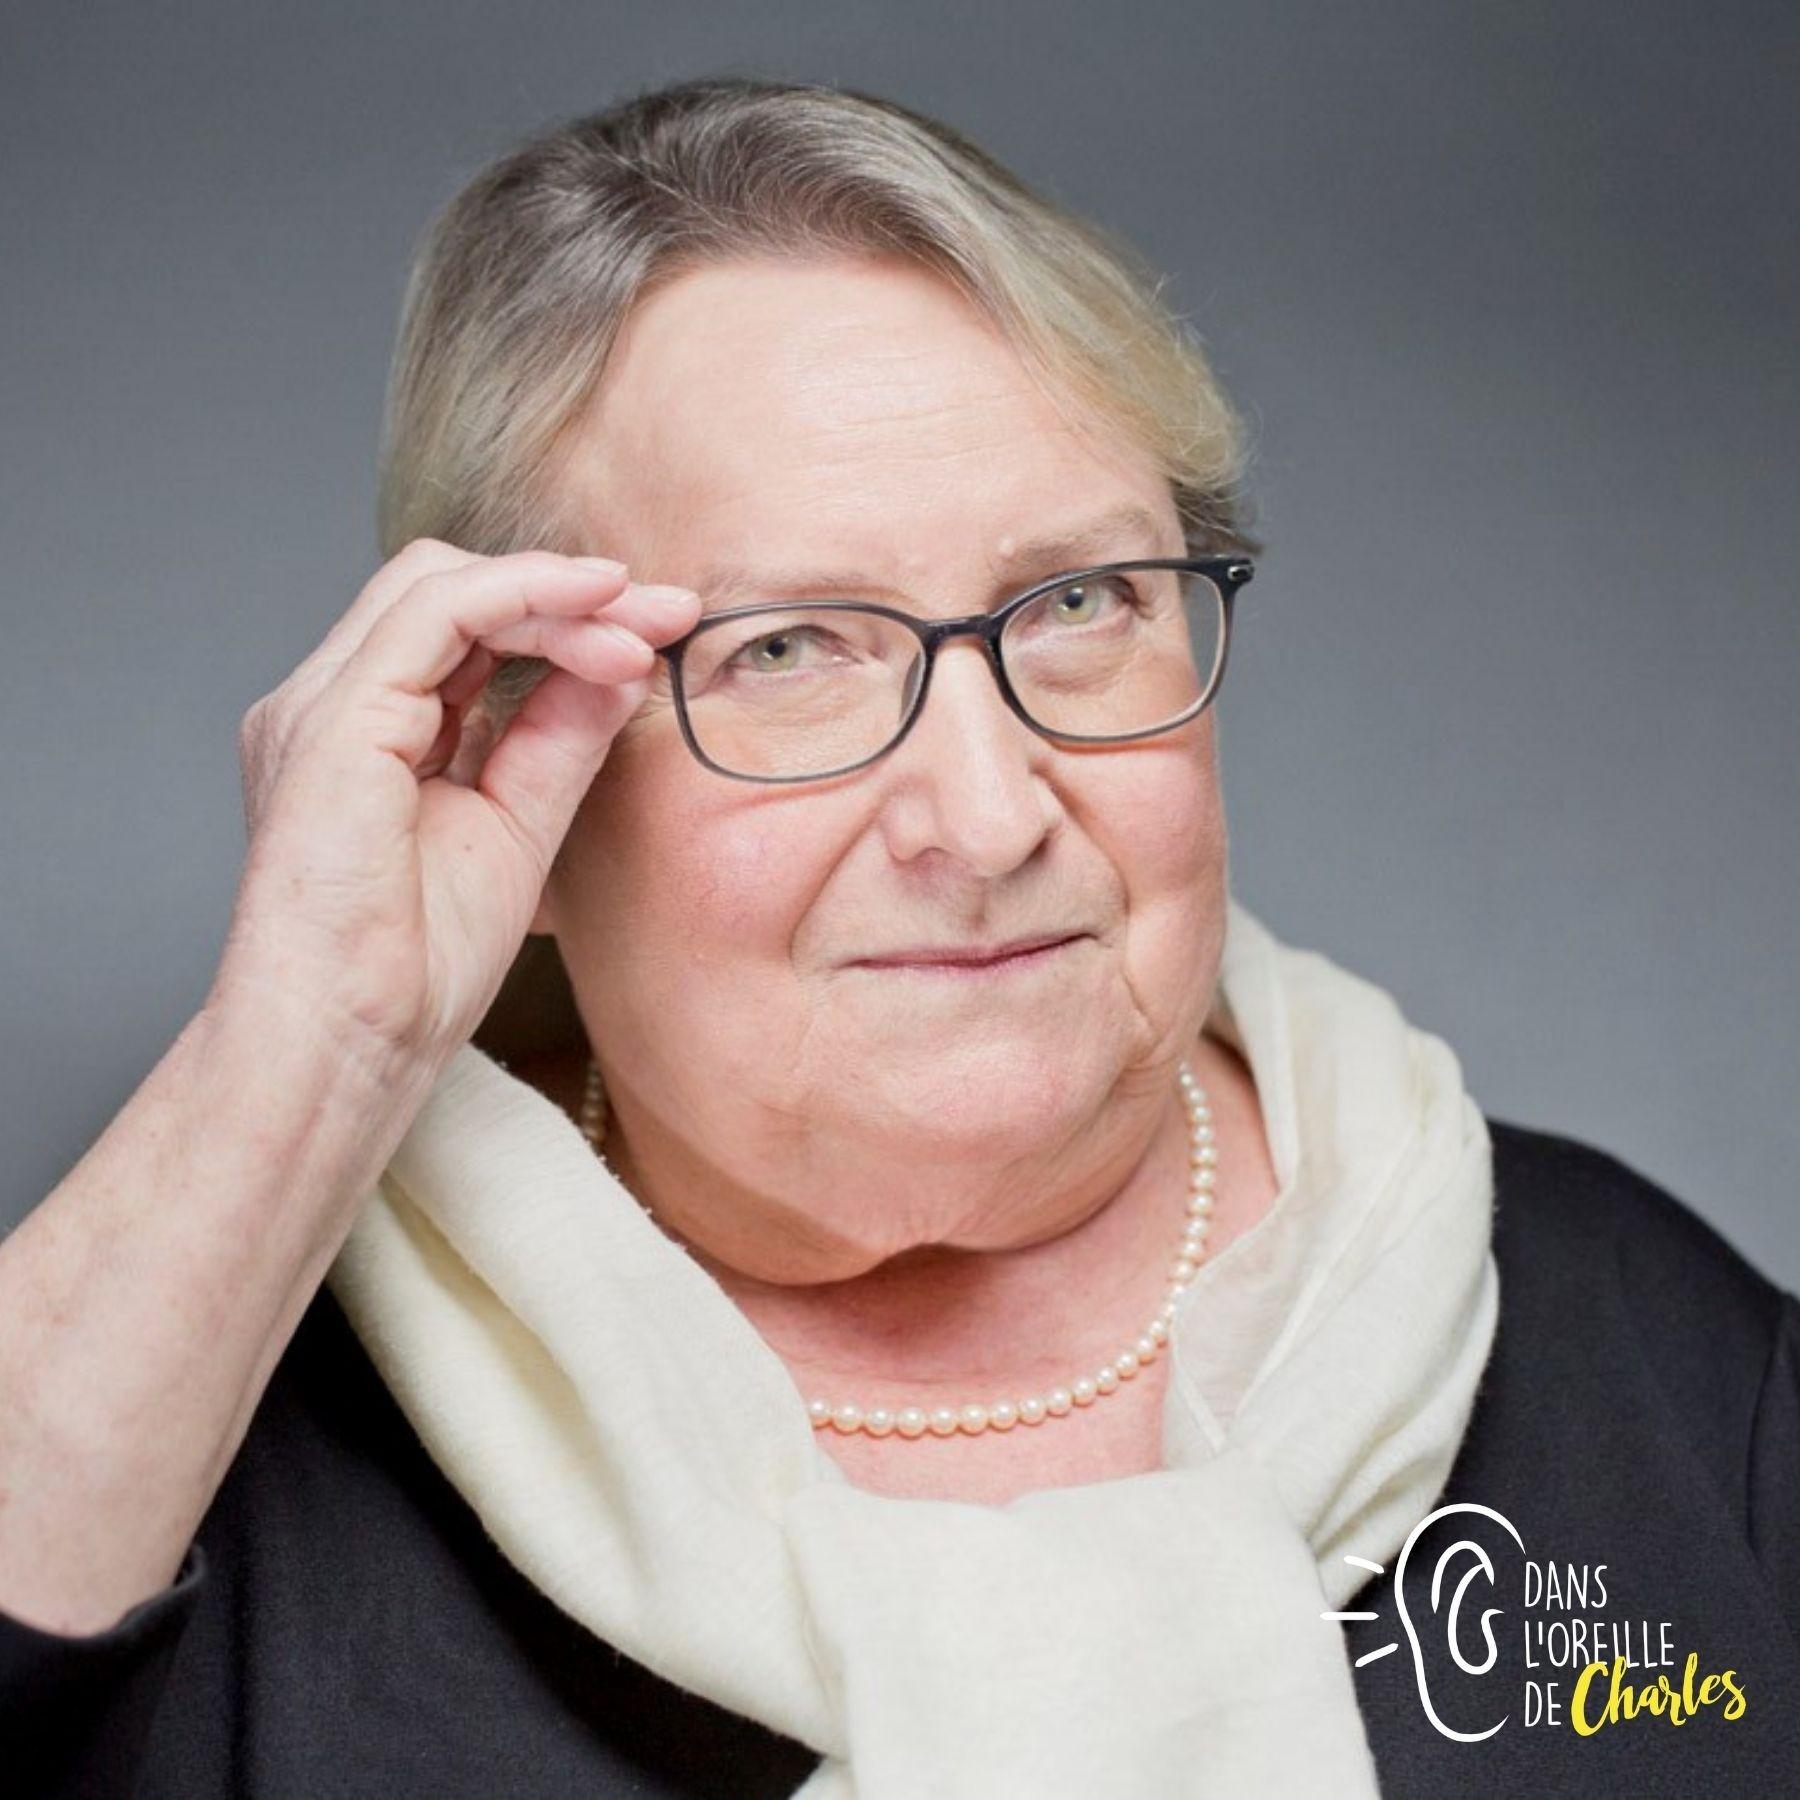 51% - Marie-Claude Kervella-Boux